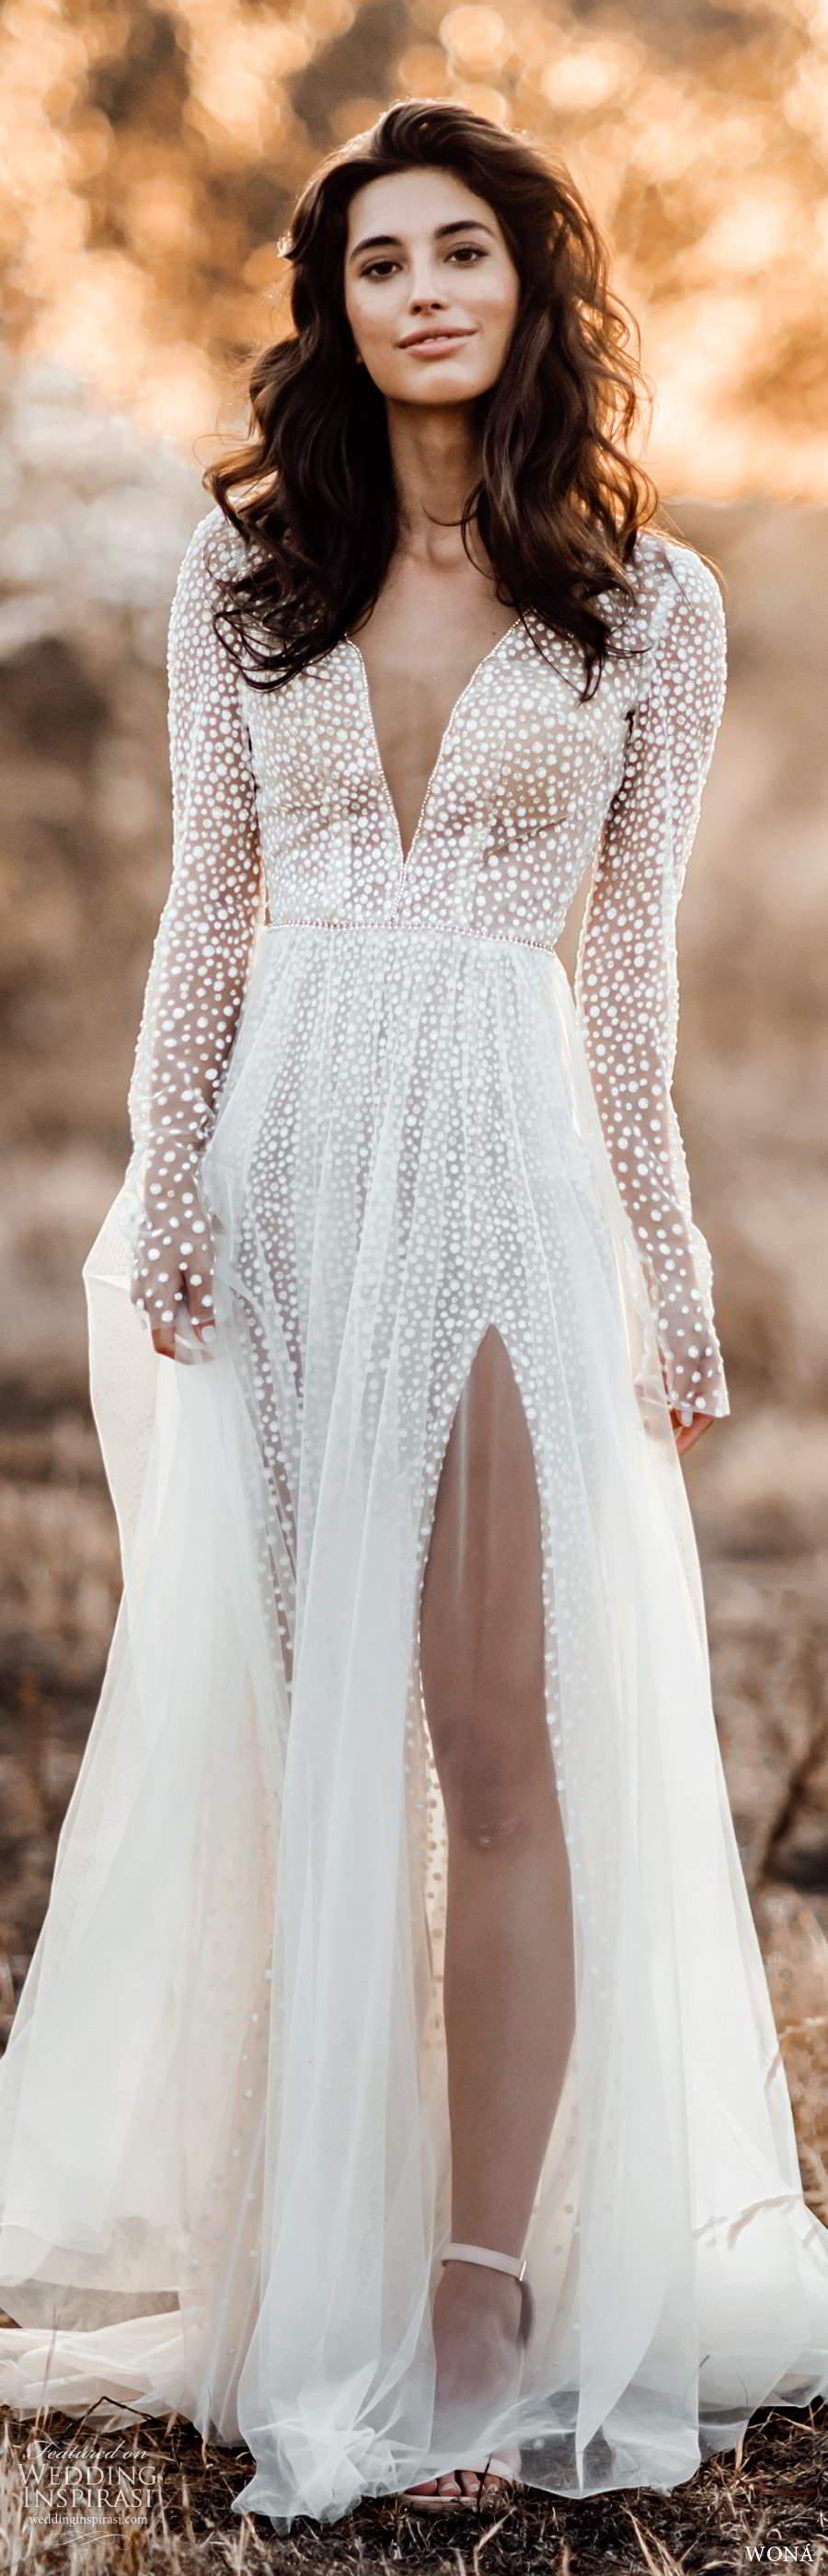 wona fall 2020 bridal illusion long sleeves plunging v neckline fully embellished a line wedding dress slit skirt chapel train (17) mv